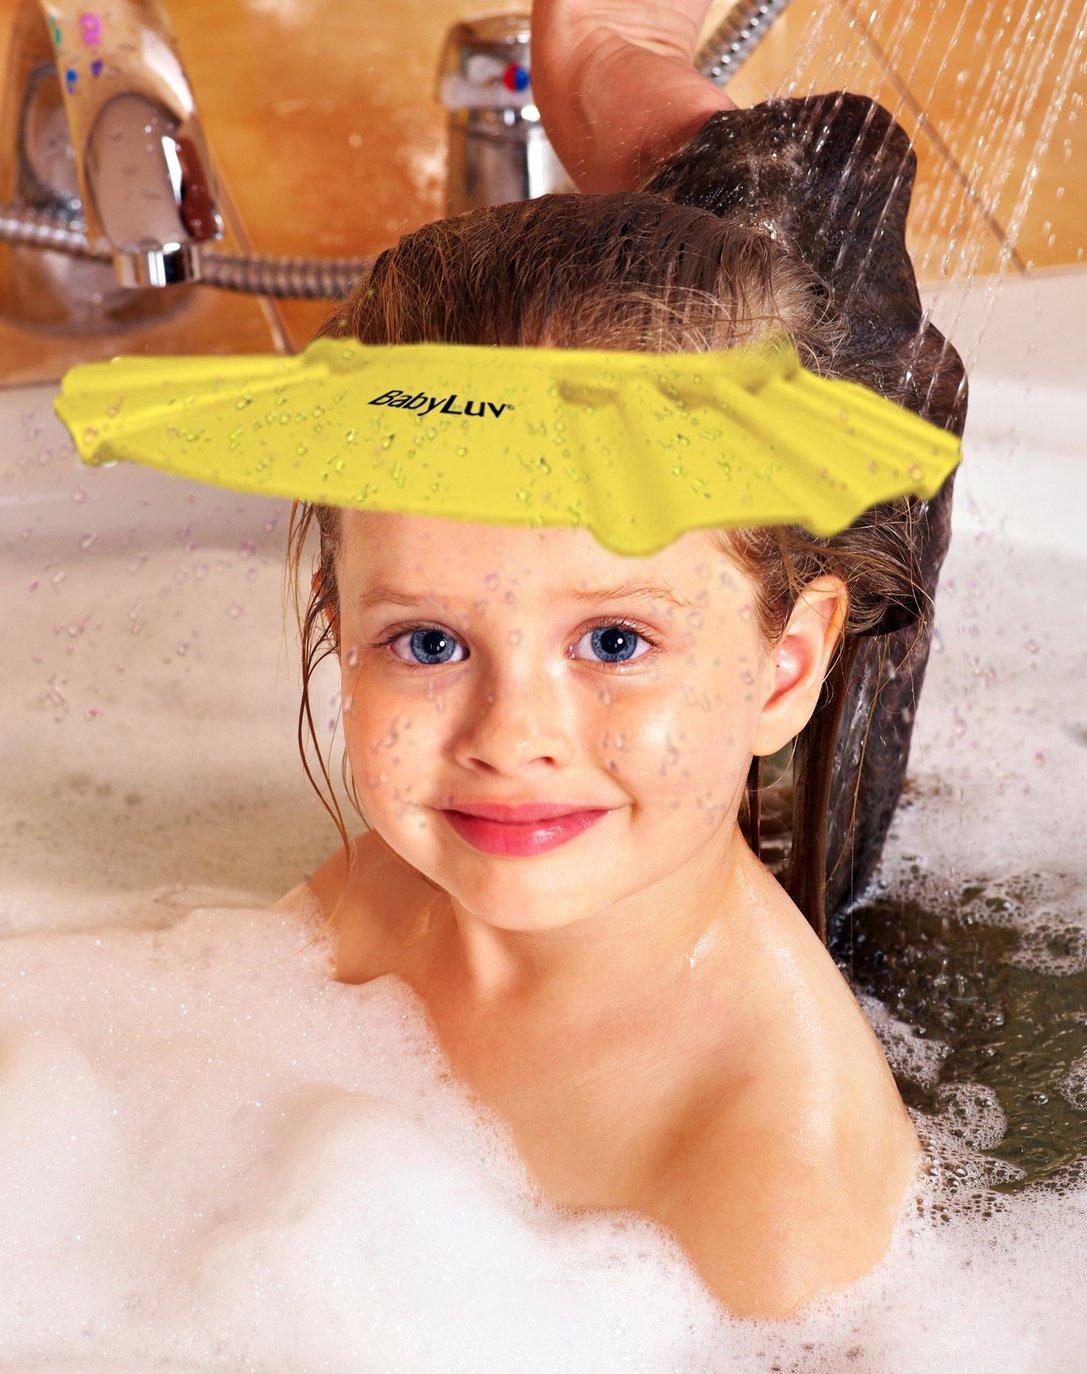 Amazon BabyLuv174 Comfortable Baby Child Bath Visor Shower Cap